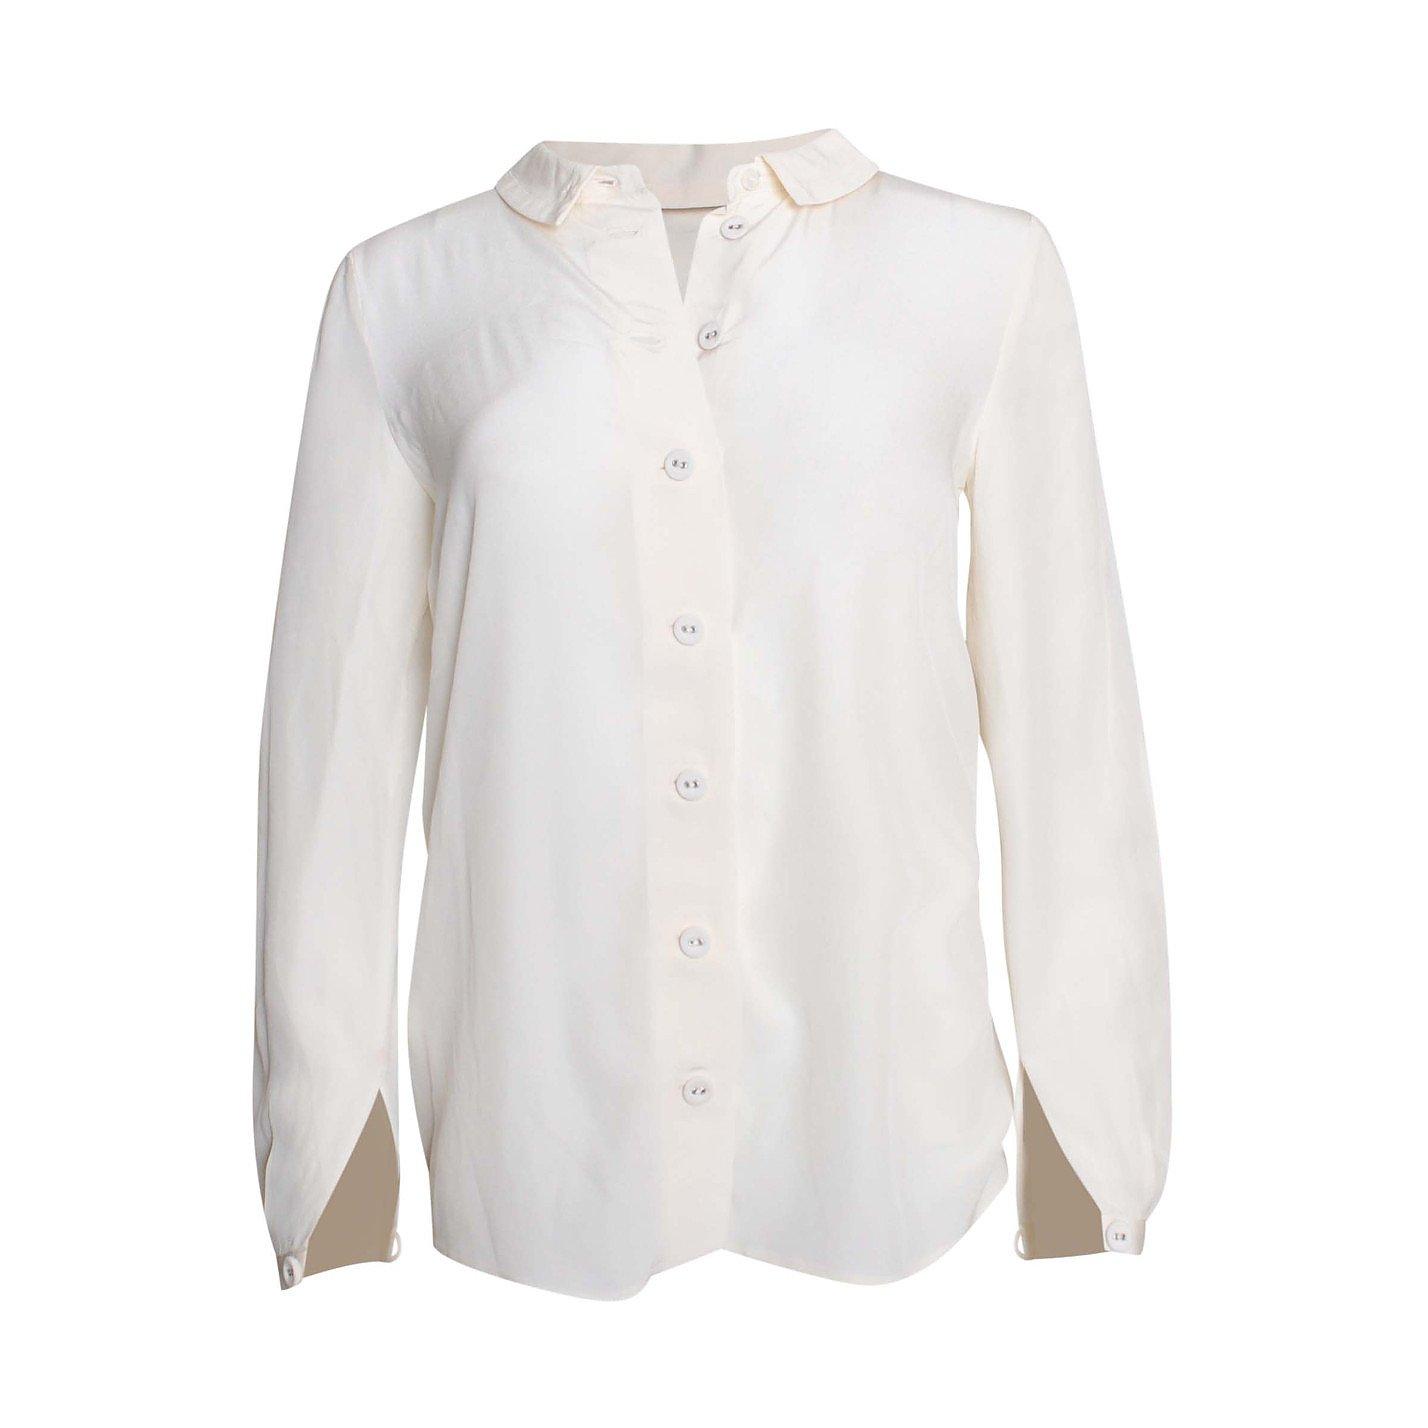 PRADA Long-Sleeved Shirt